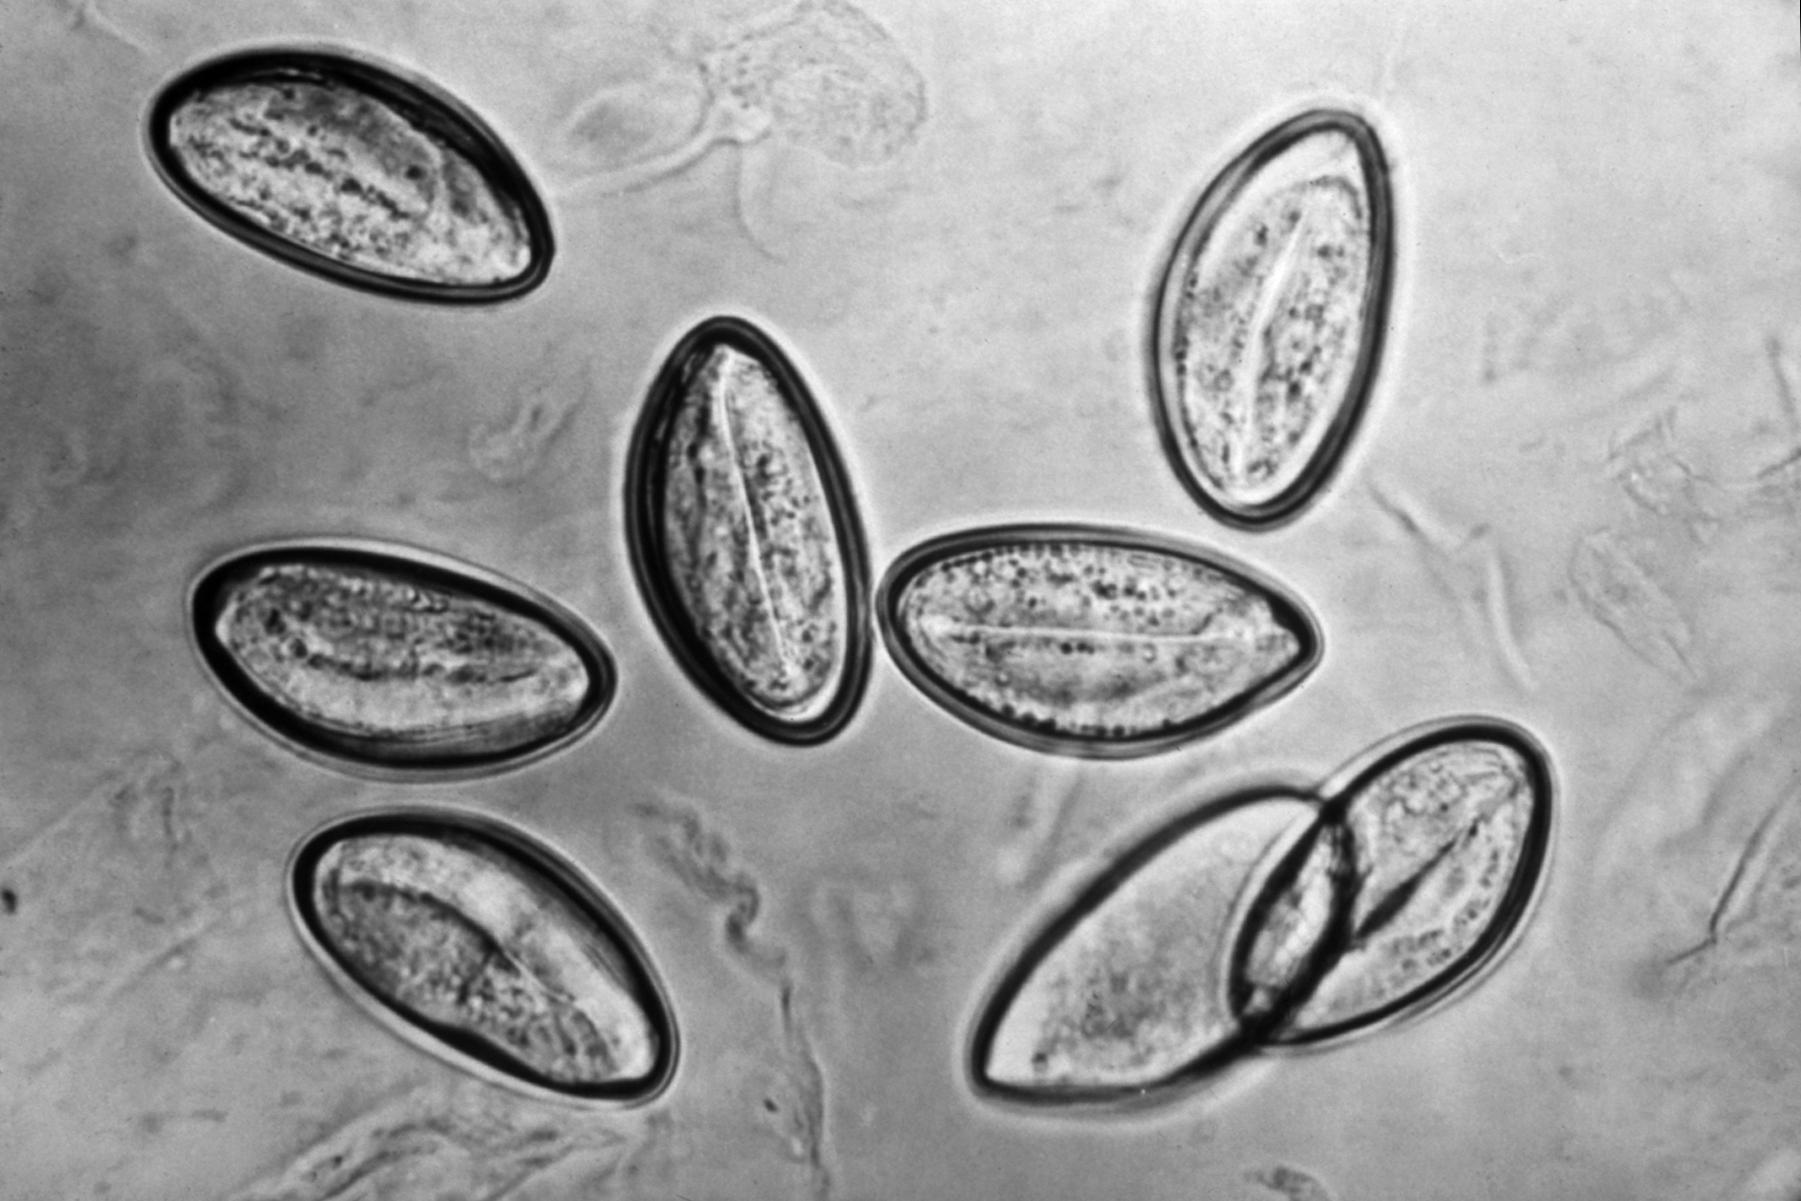 enterobius vermicularis roundworm retete de detoxifiere a ficatului